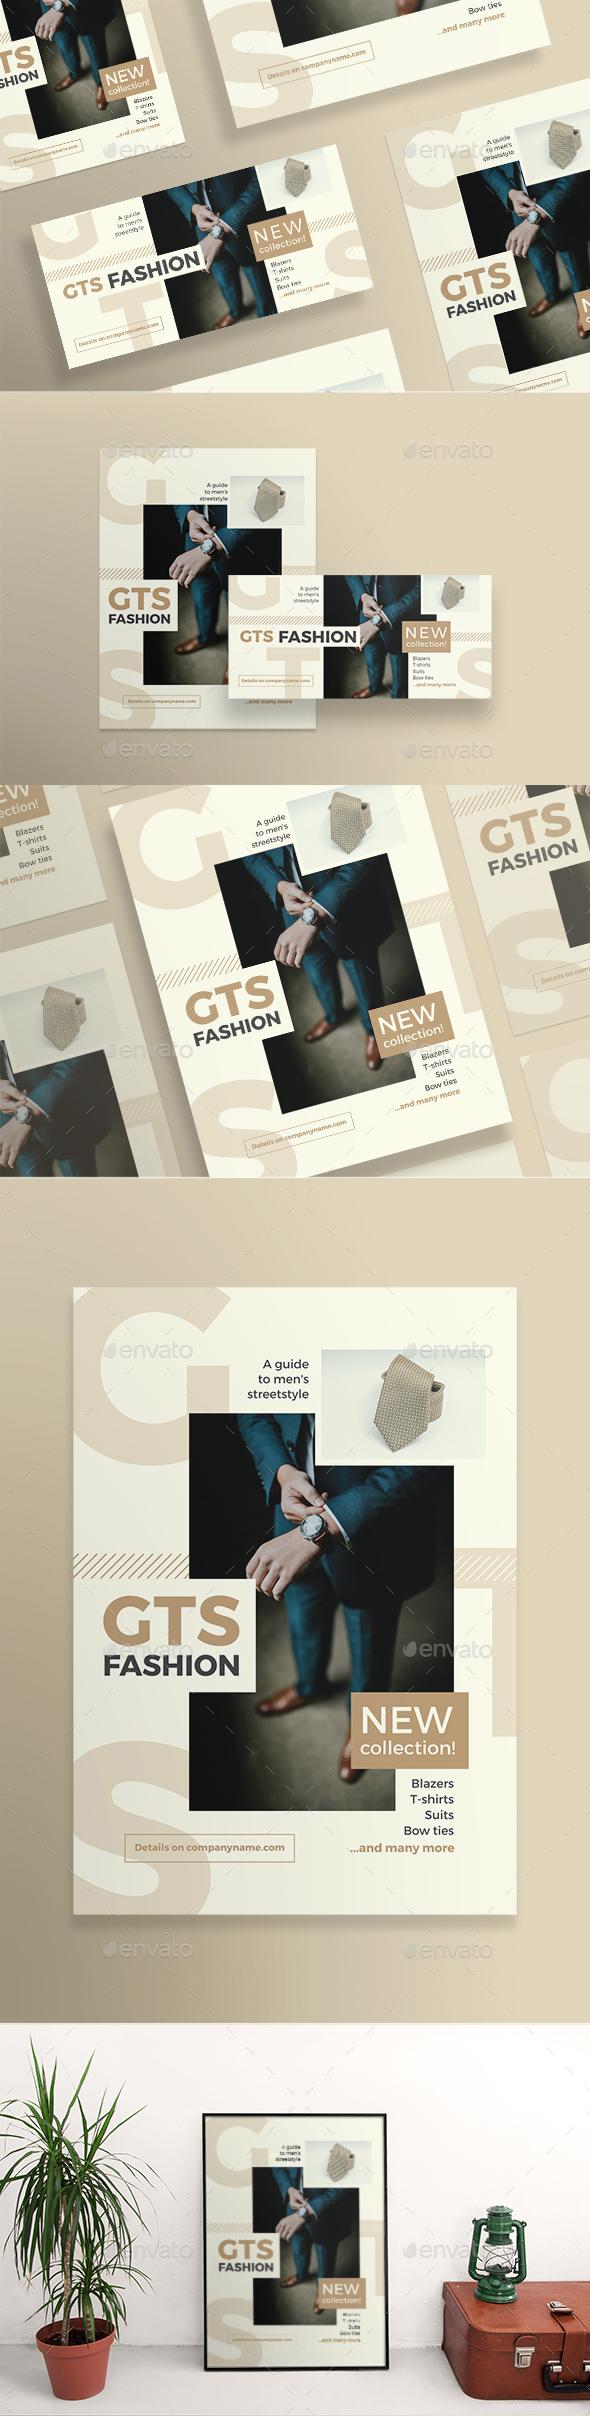 Men's Fashion Flyers - Flyers Print Templates